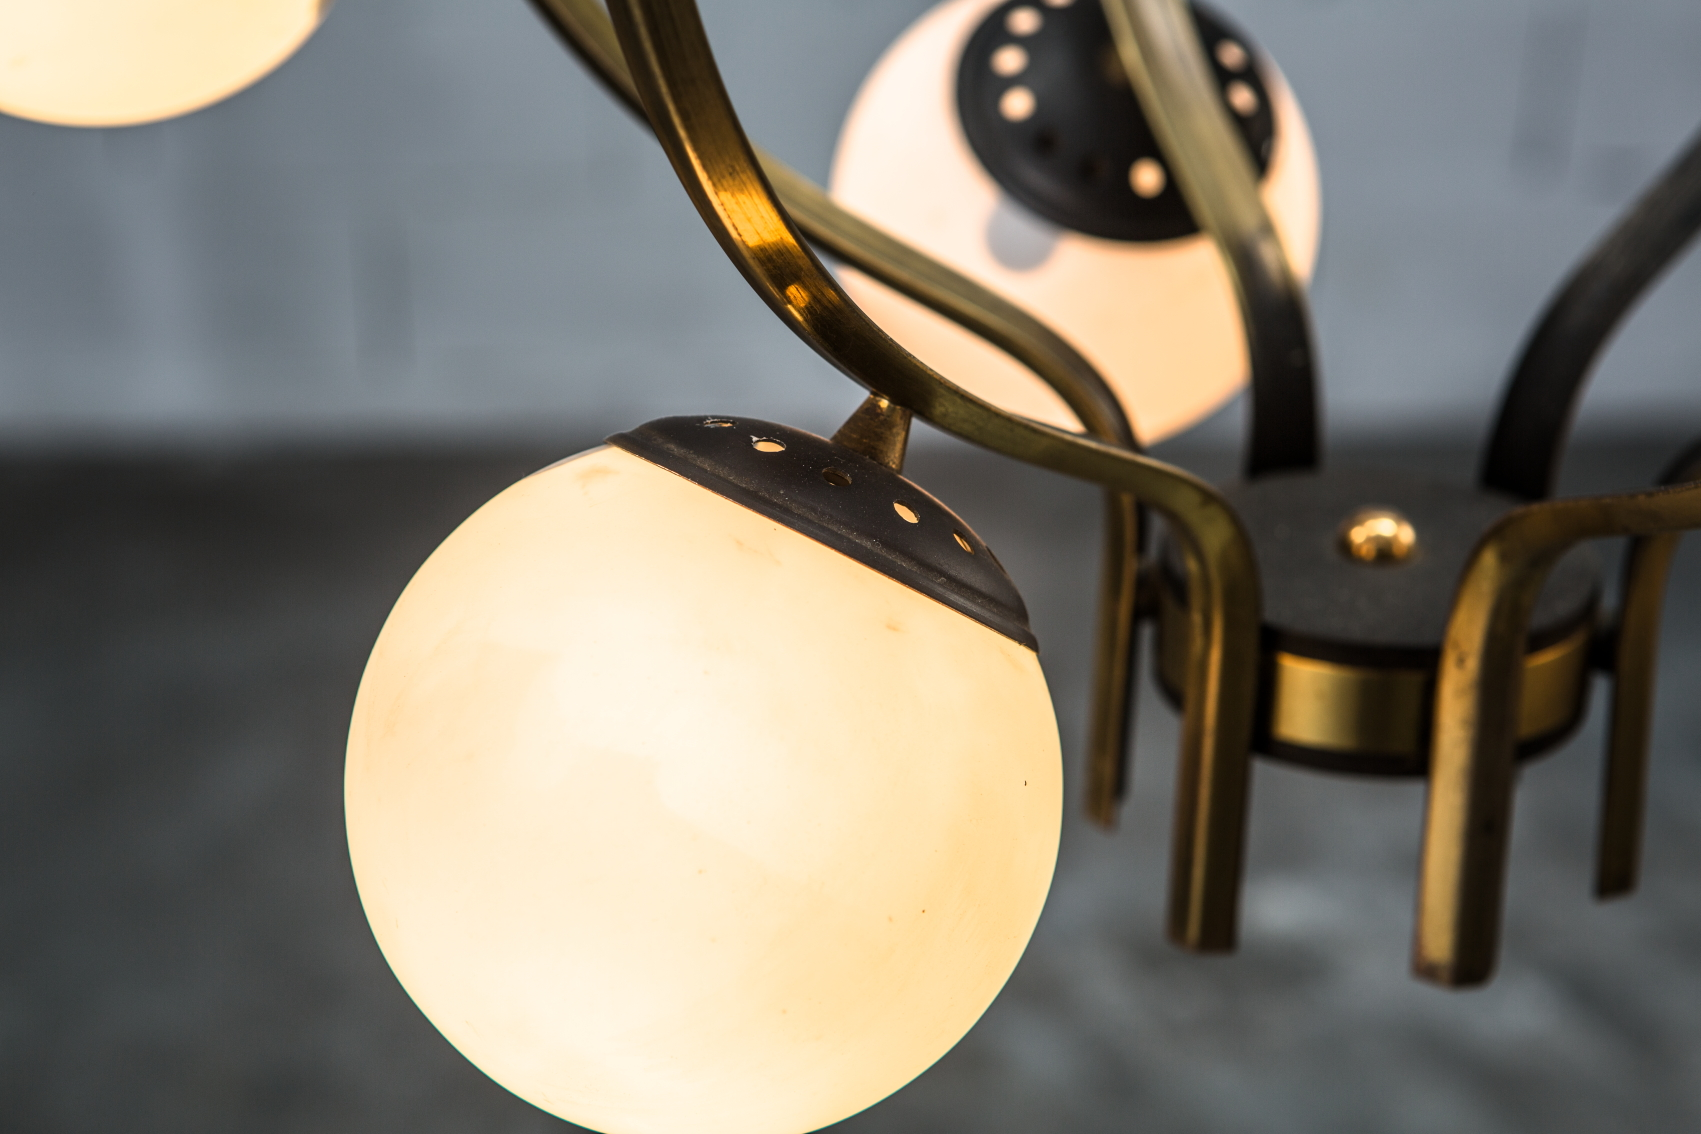 Stilnovo 12 lights chandelier 1950s made by brass, aluminium and opaline glass - Opaline balls detail